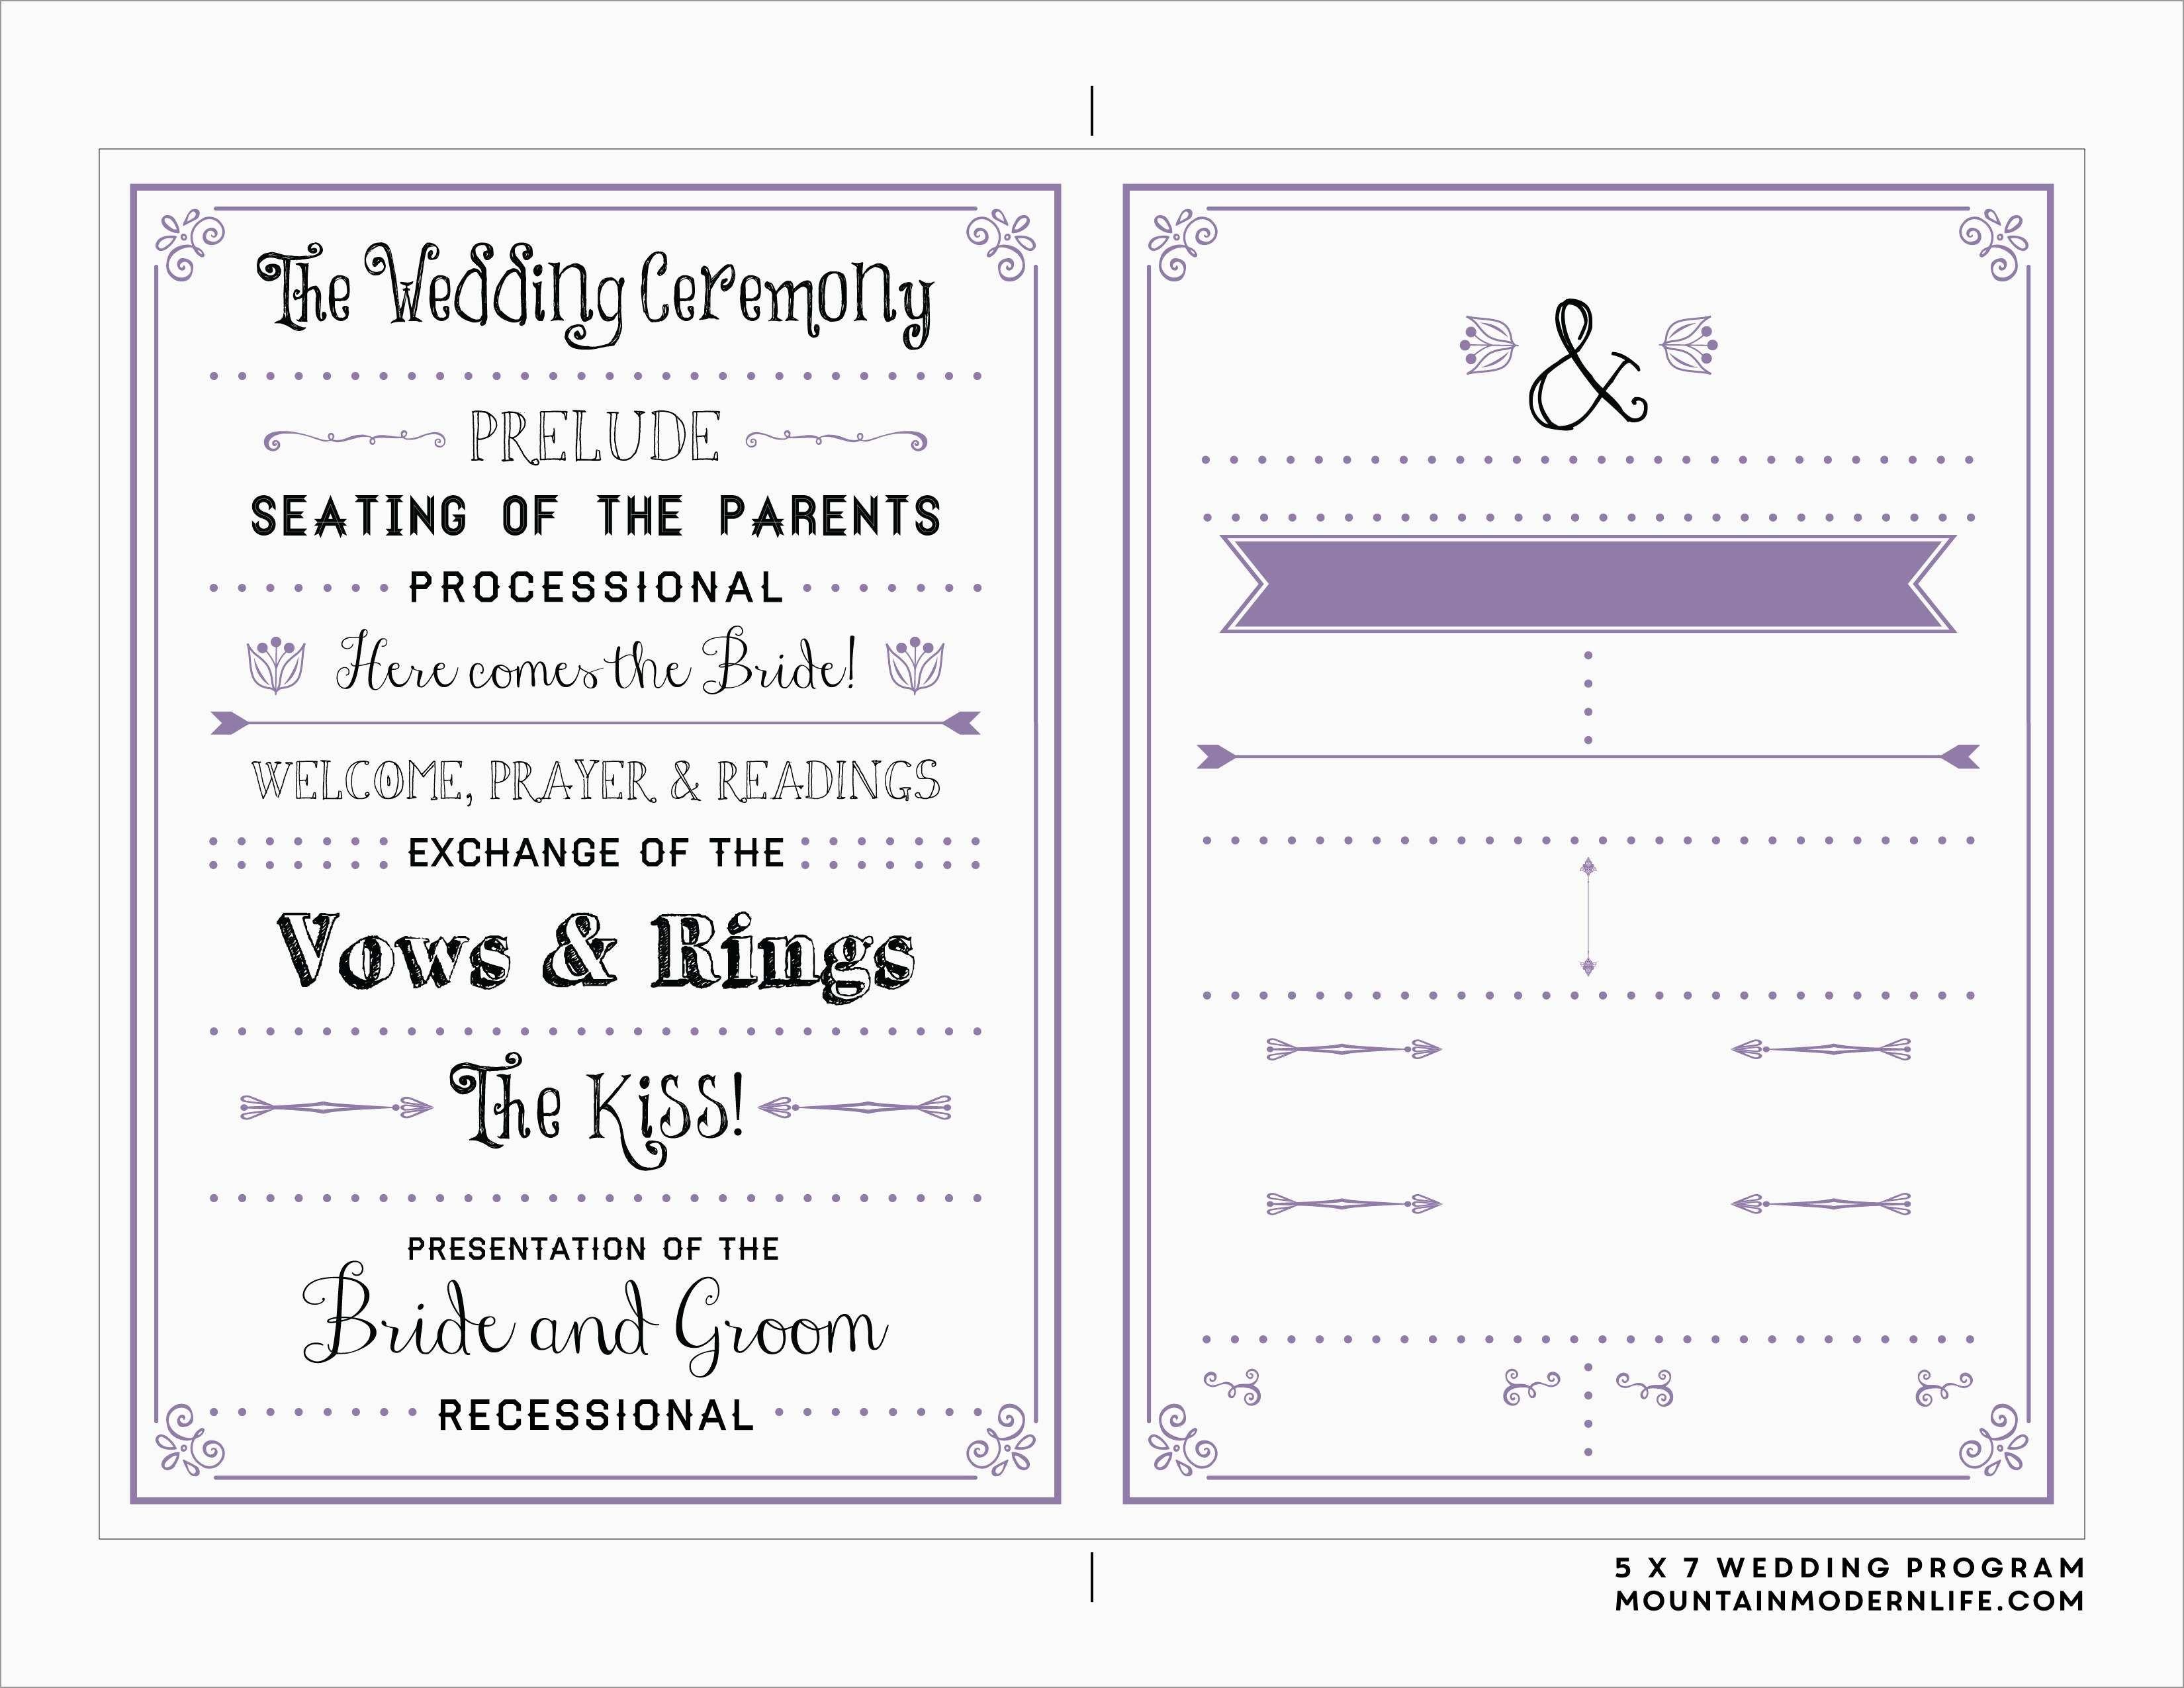 Free Printable Program Templates For Church Best Wedding Ceremony - Free Printable Wedding Program Templates Word